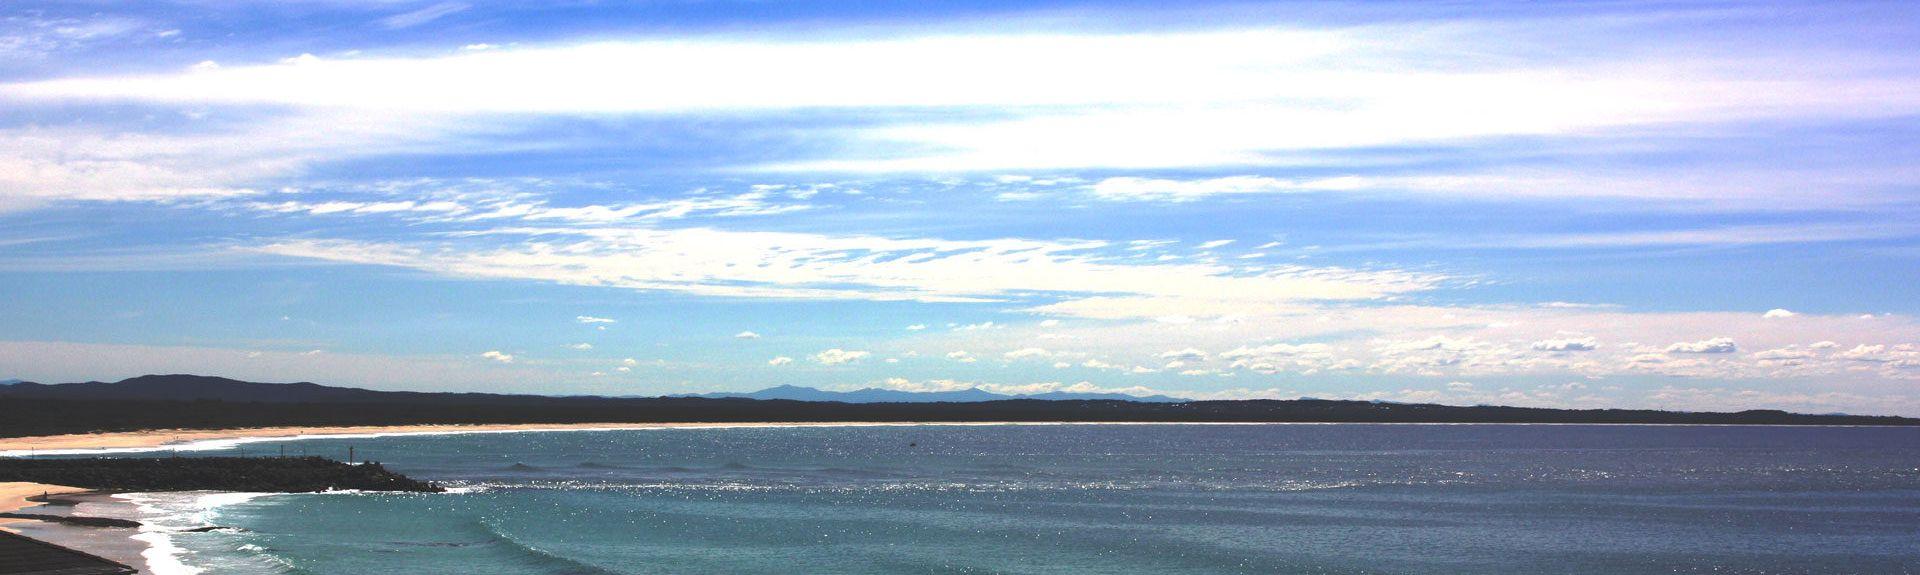 Black Head Beach, NSW, Australia